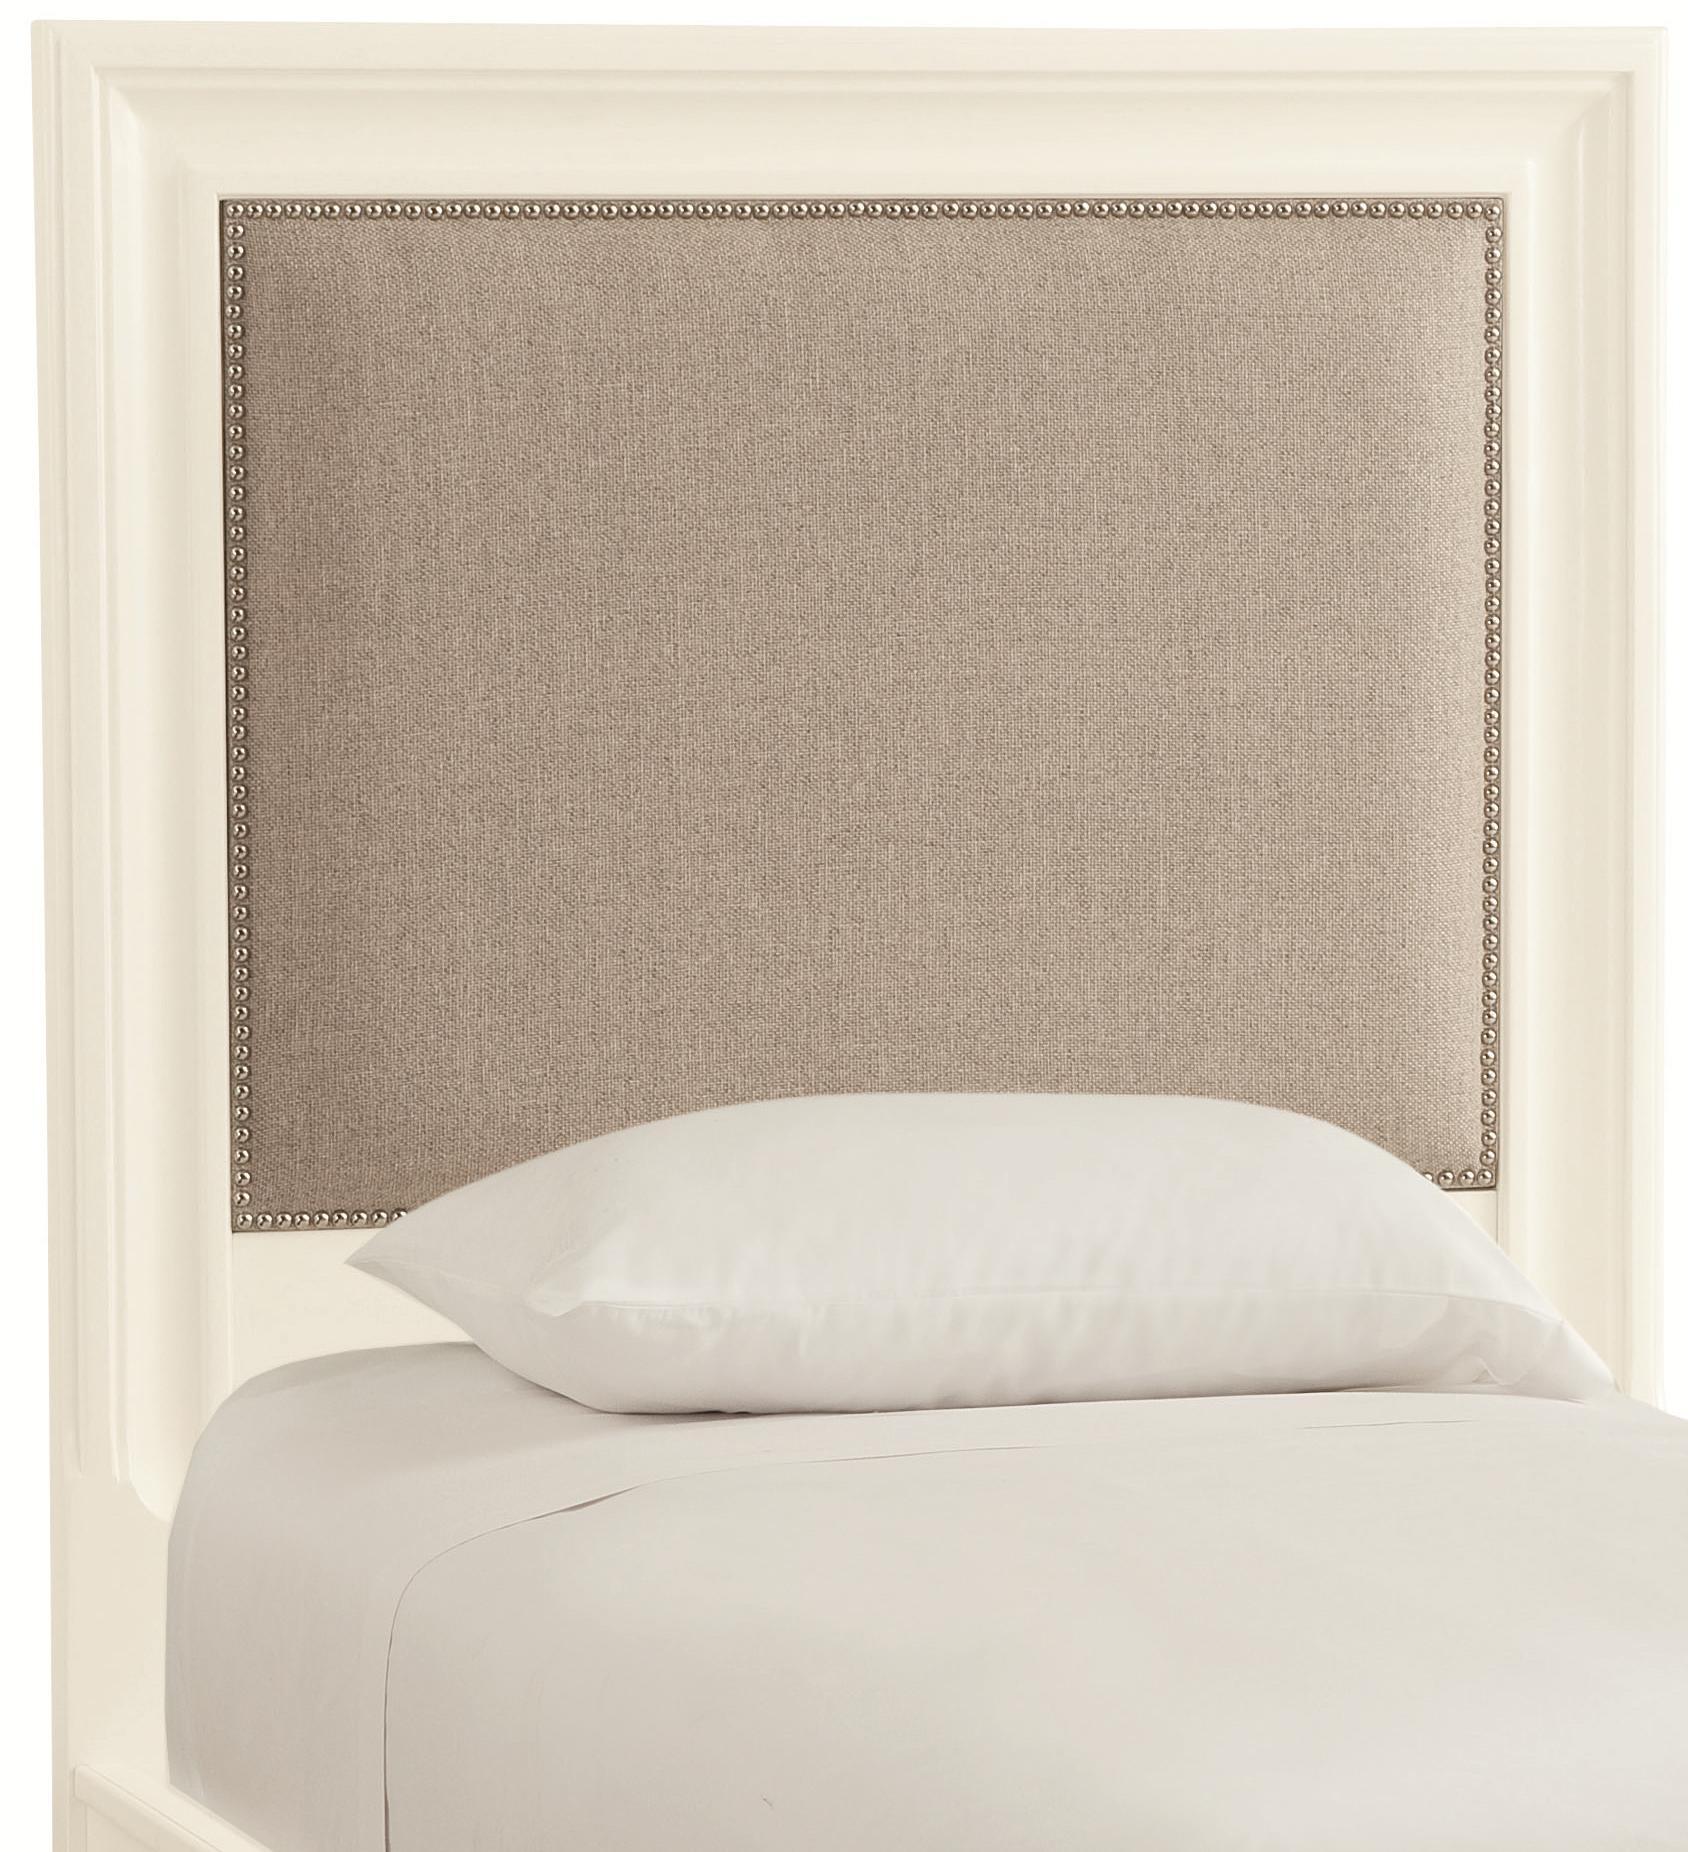 Thomasville® Manuscript Twin Upholstered Headboard - Item Number: 82915-433